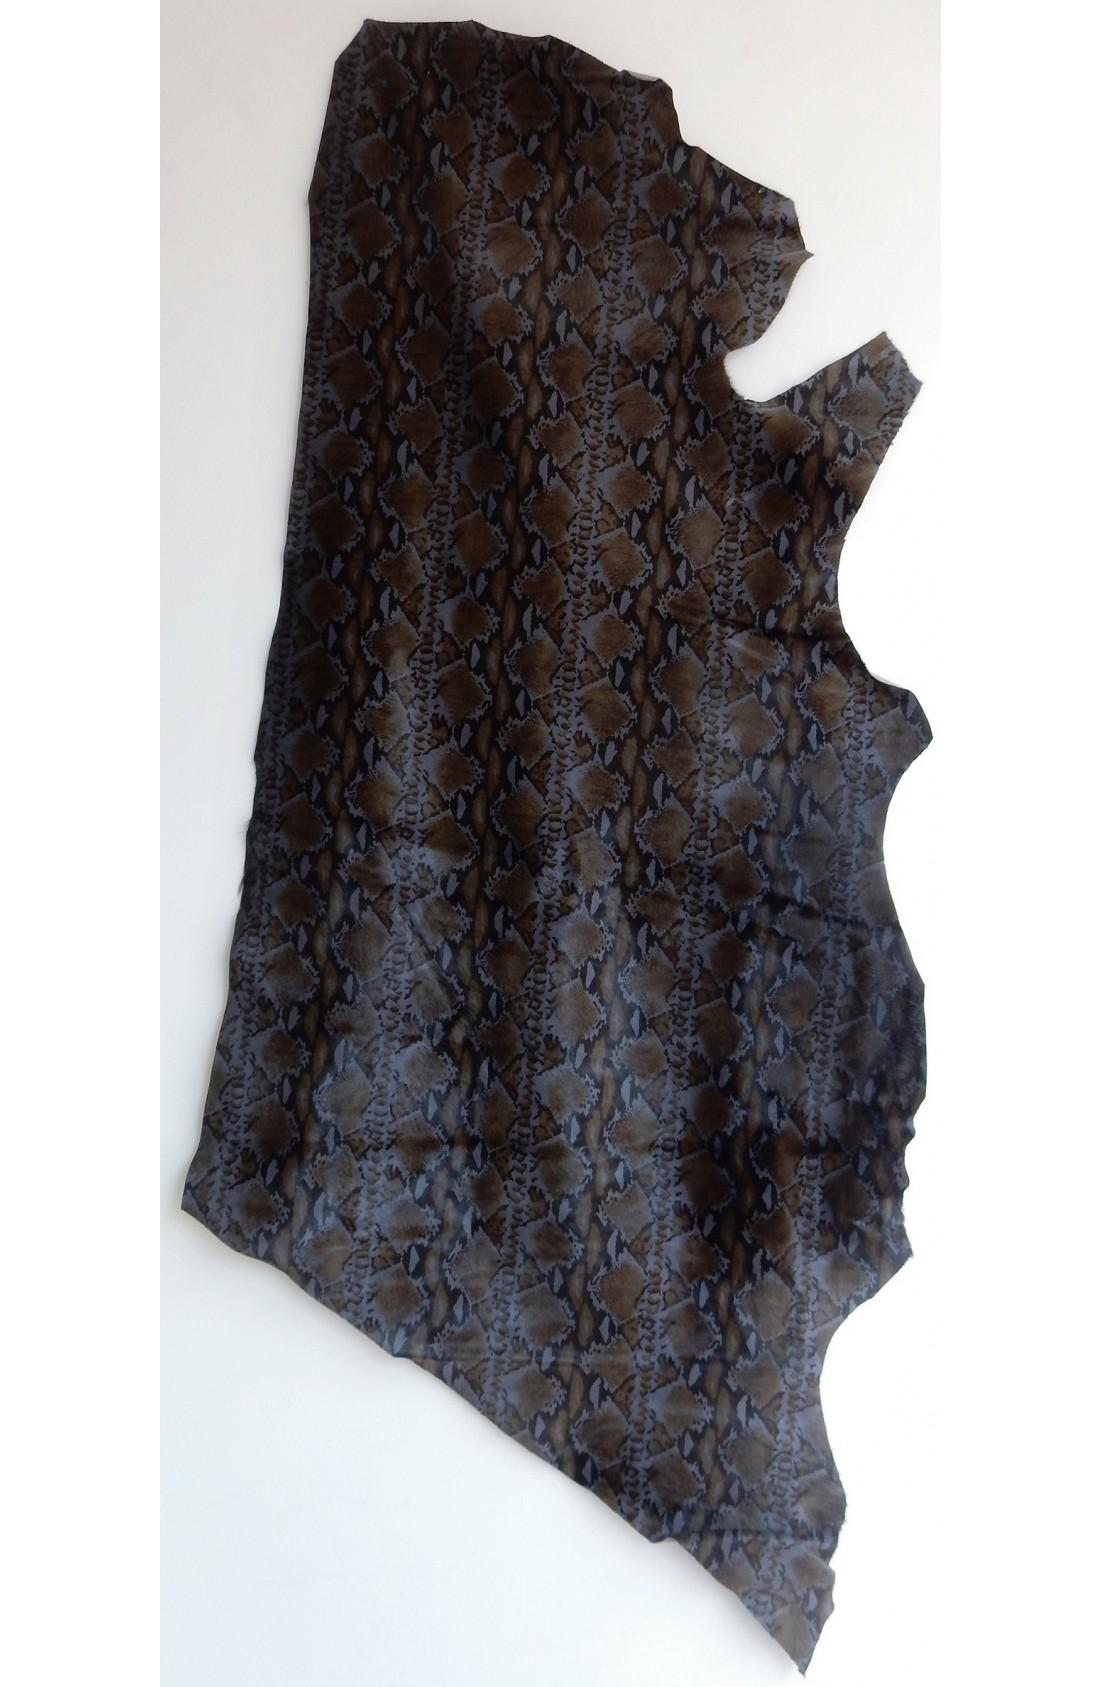 art. 62 VITELLO PELO var.12 grigio polvere stampa tigrata (1)